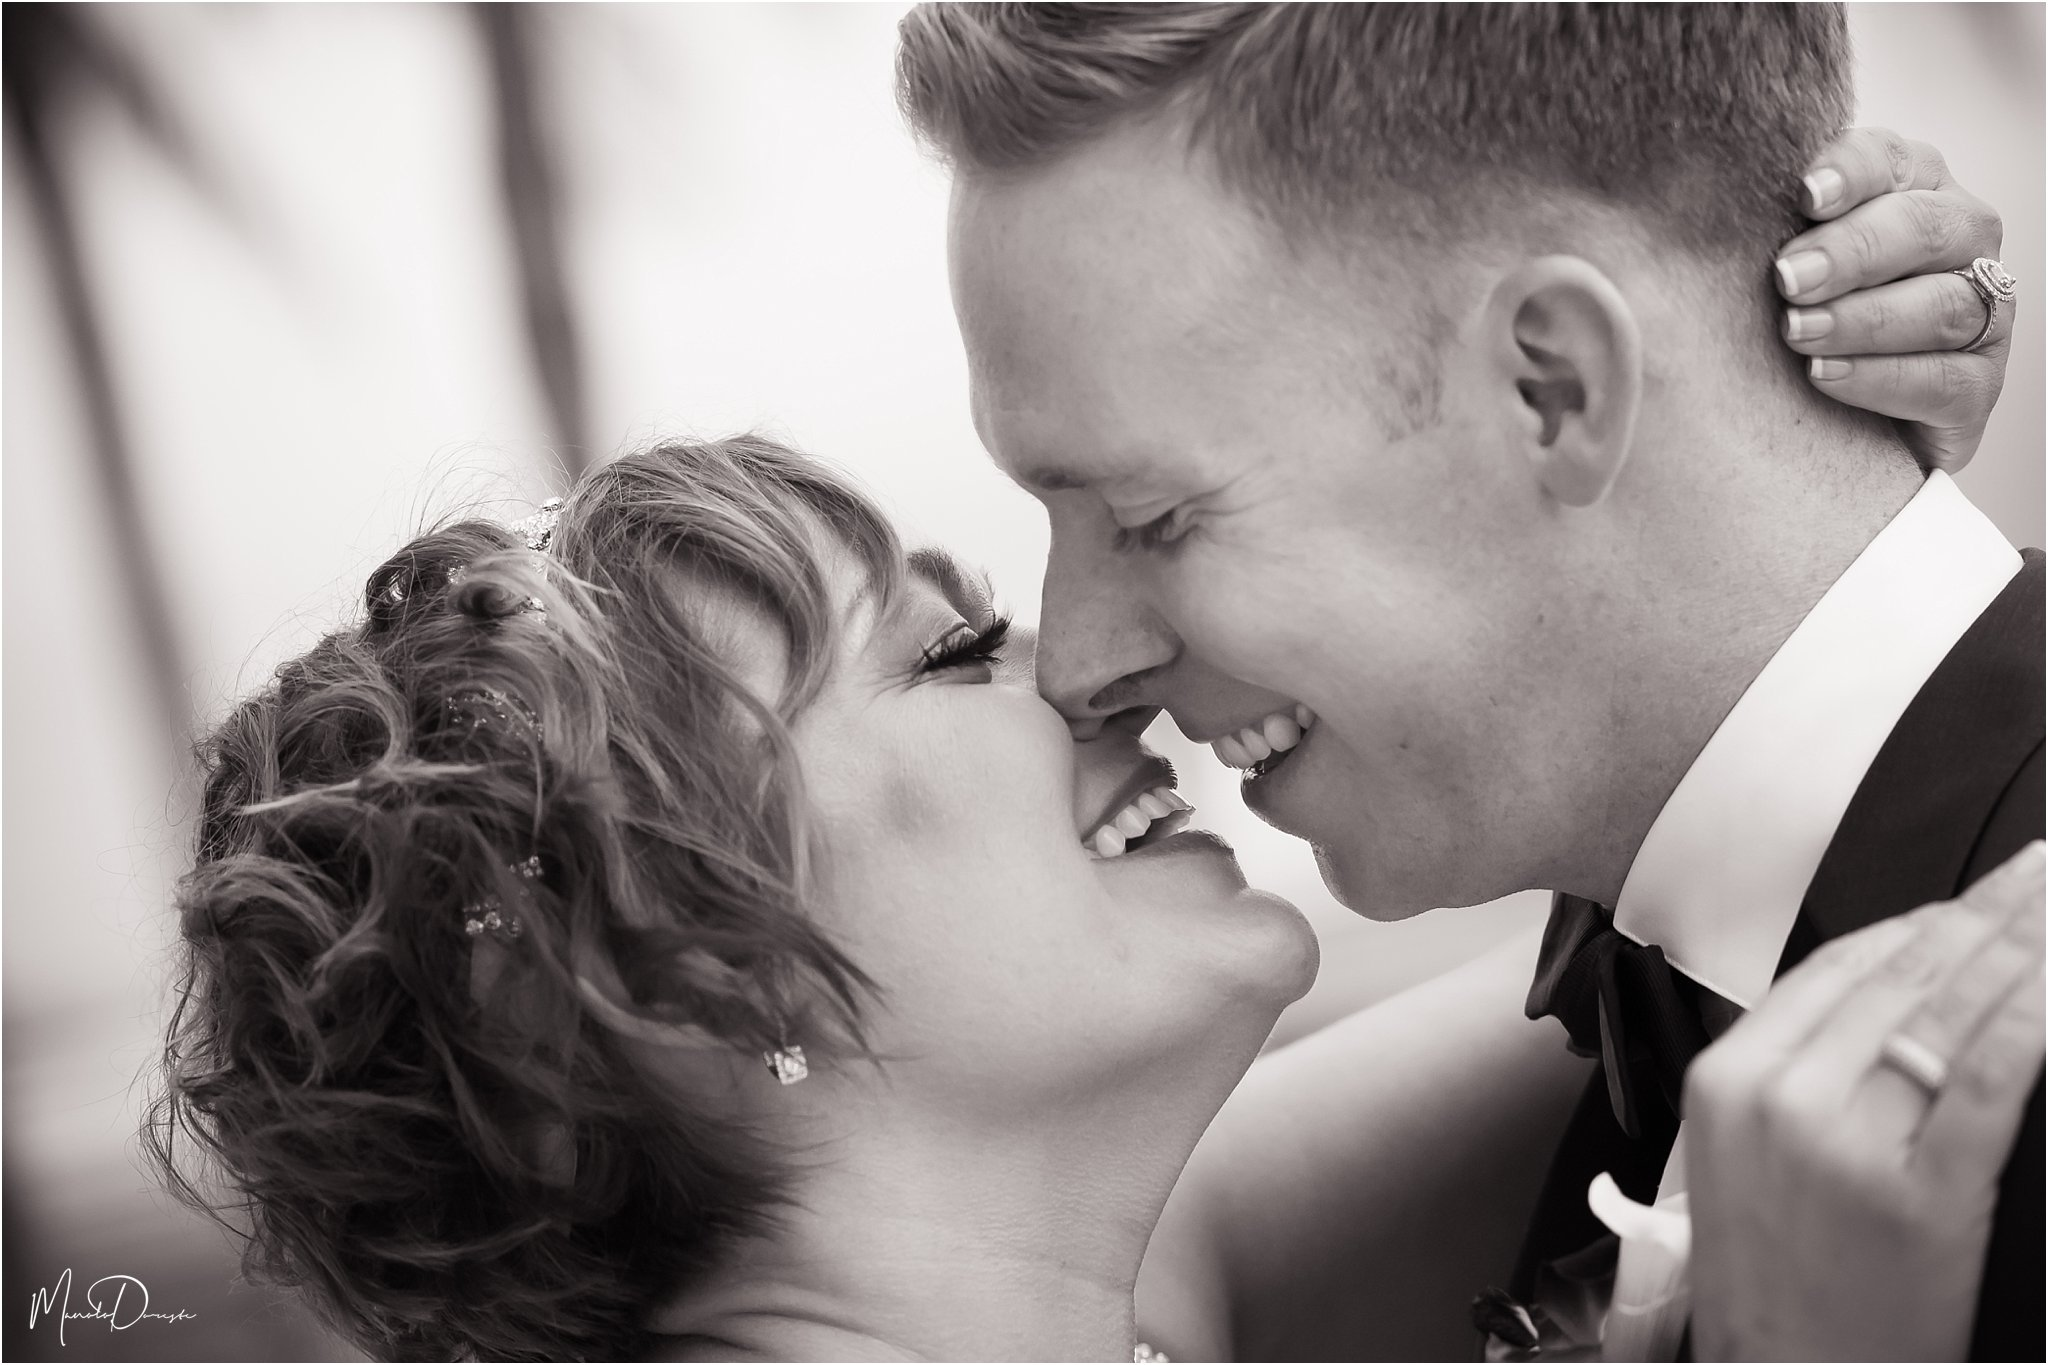 0449_ManoloDoreste_InFocusStudios_Wedding_Family_Photography_Miami_MiamiPhotographer.jpg